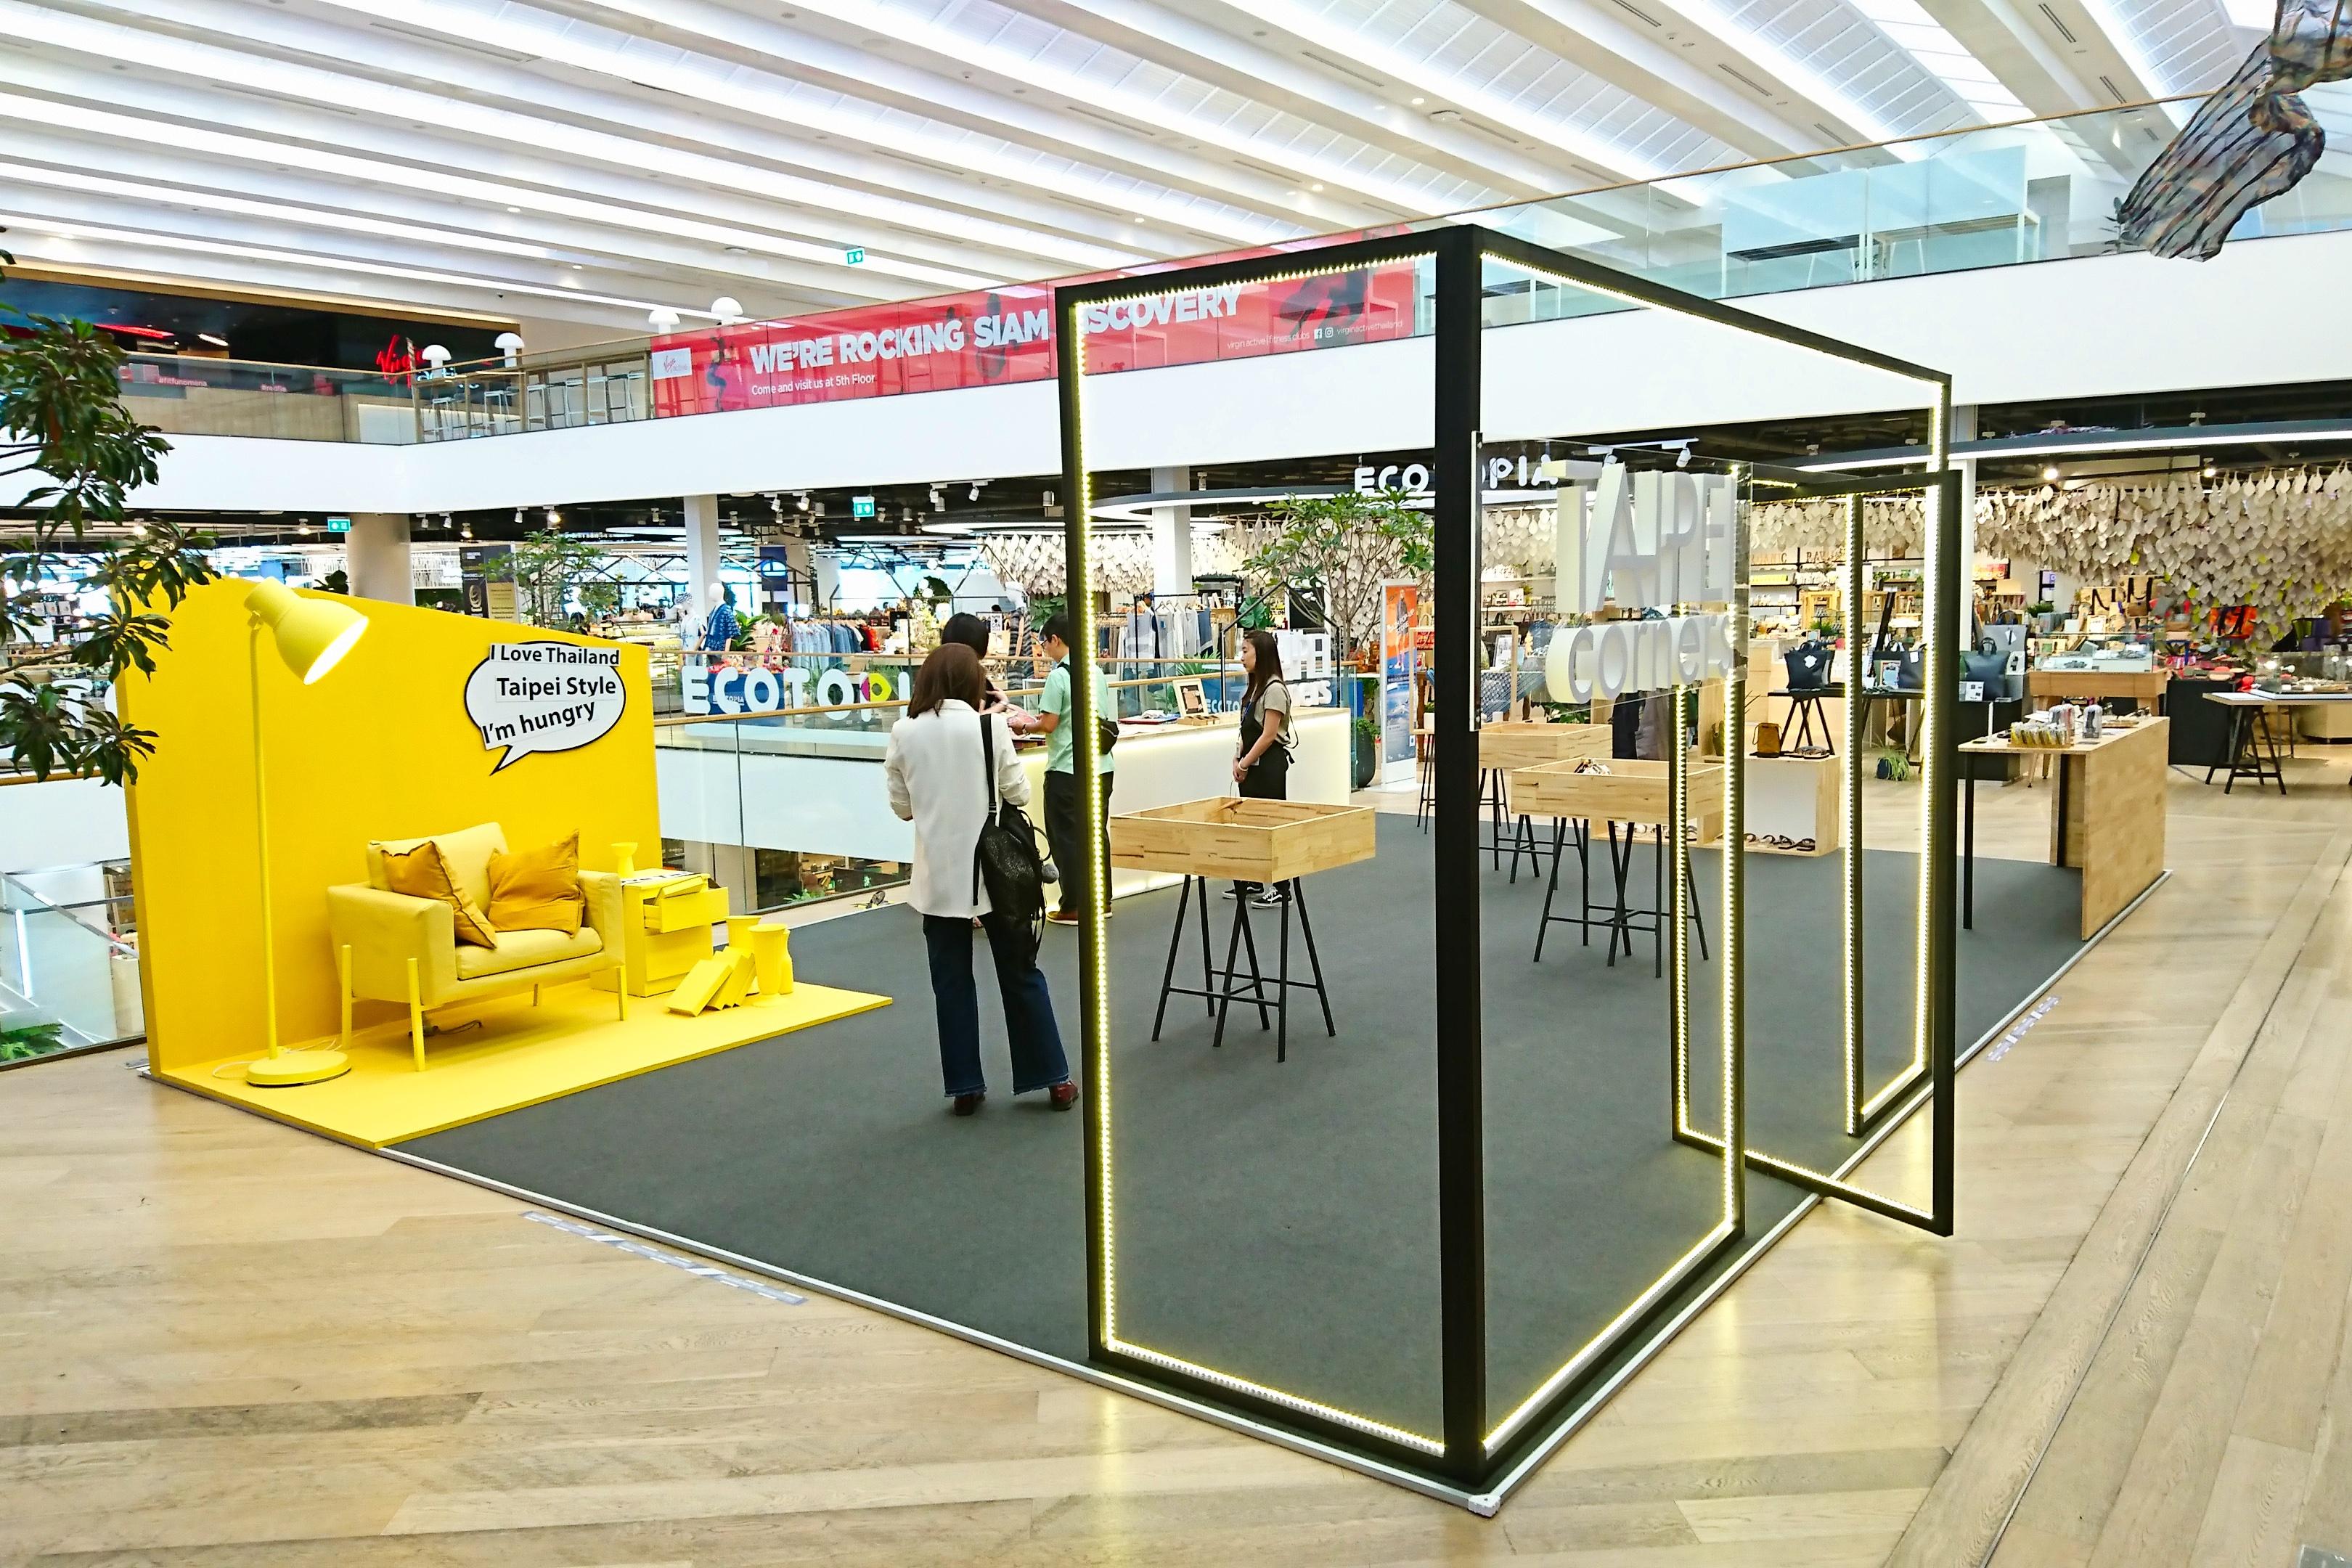 Exhibition Stand Builders Bangkok : Asia exhibition stand builder astute international big bih